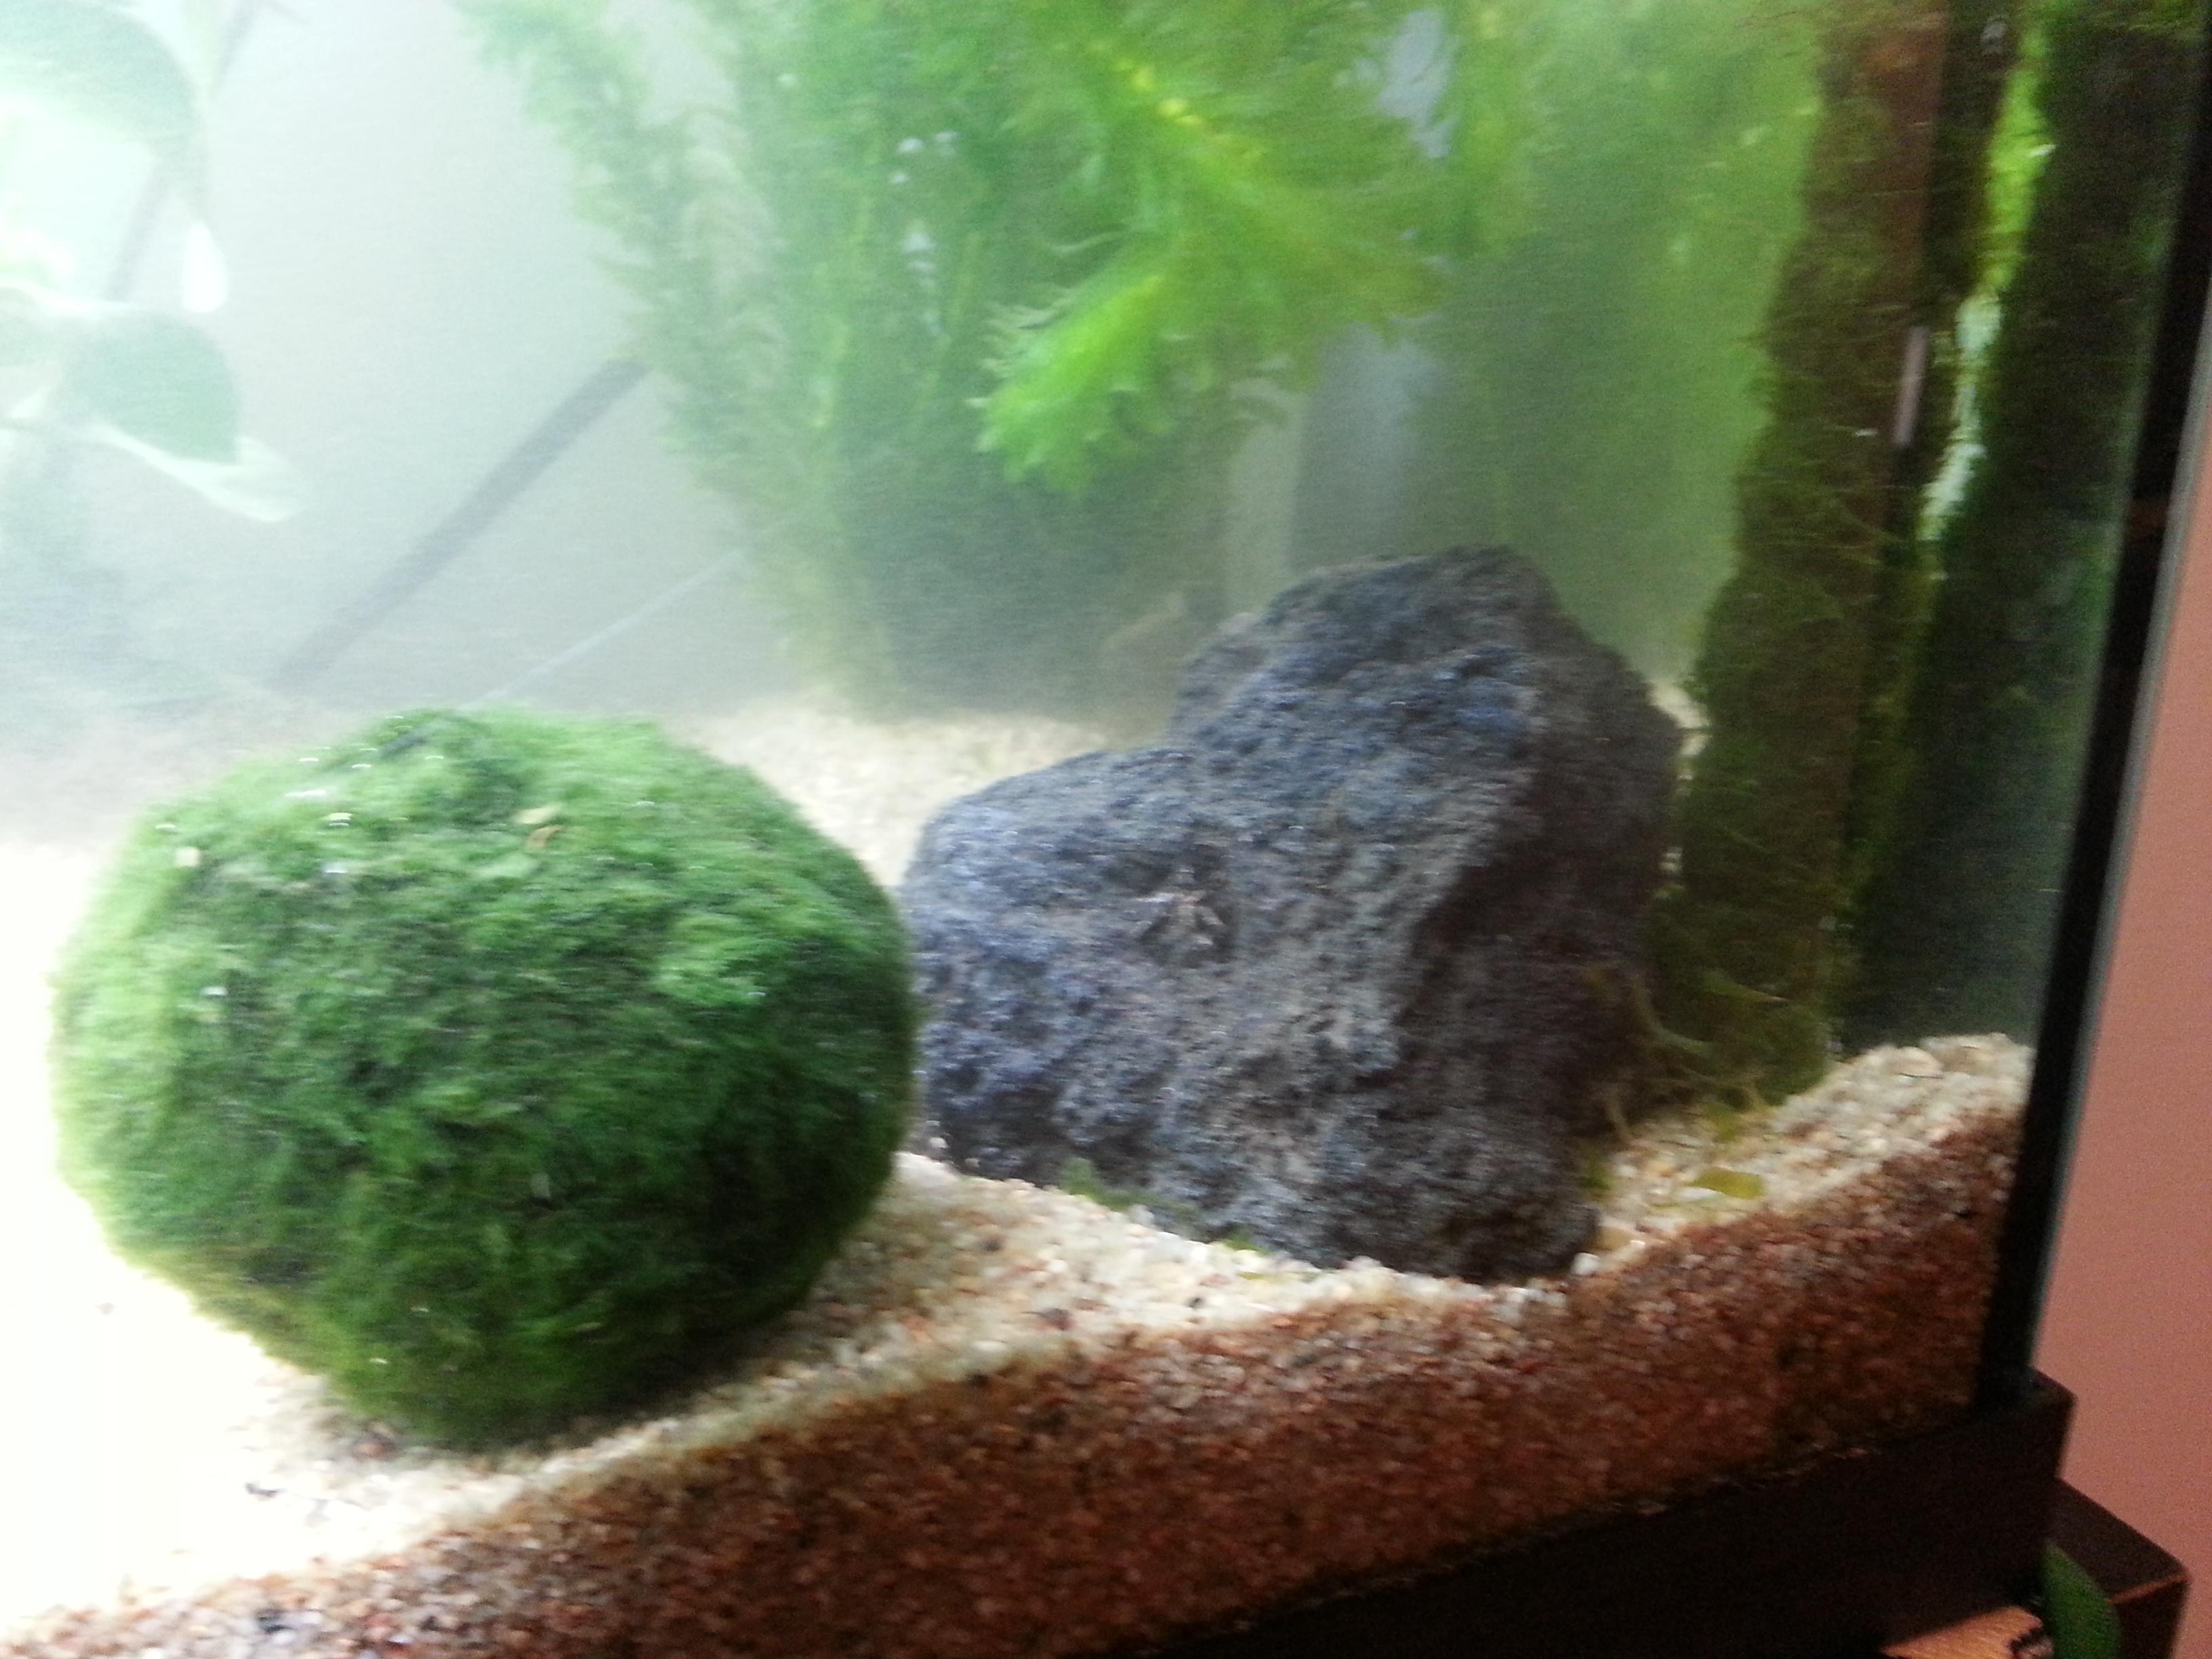 plante dans un aquarium 89854120130613003143